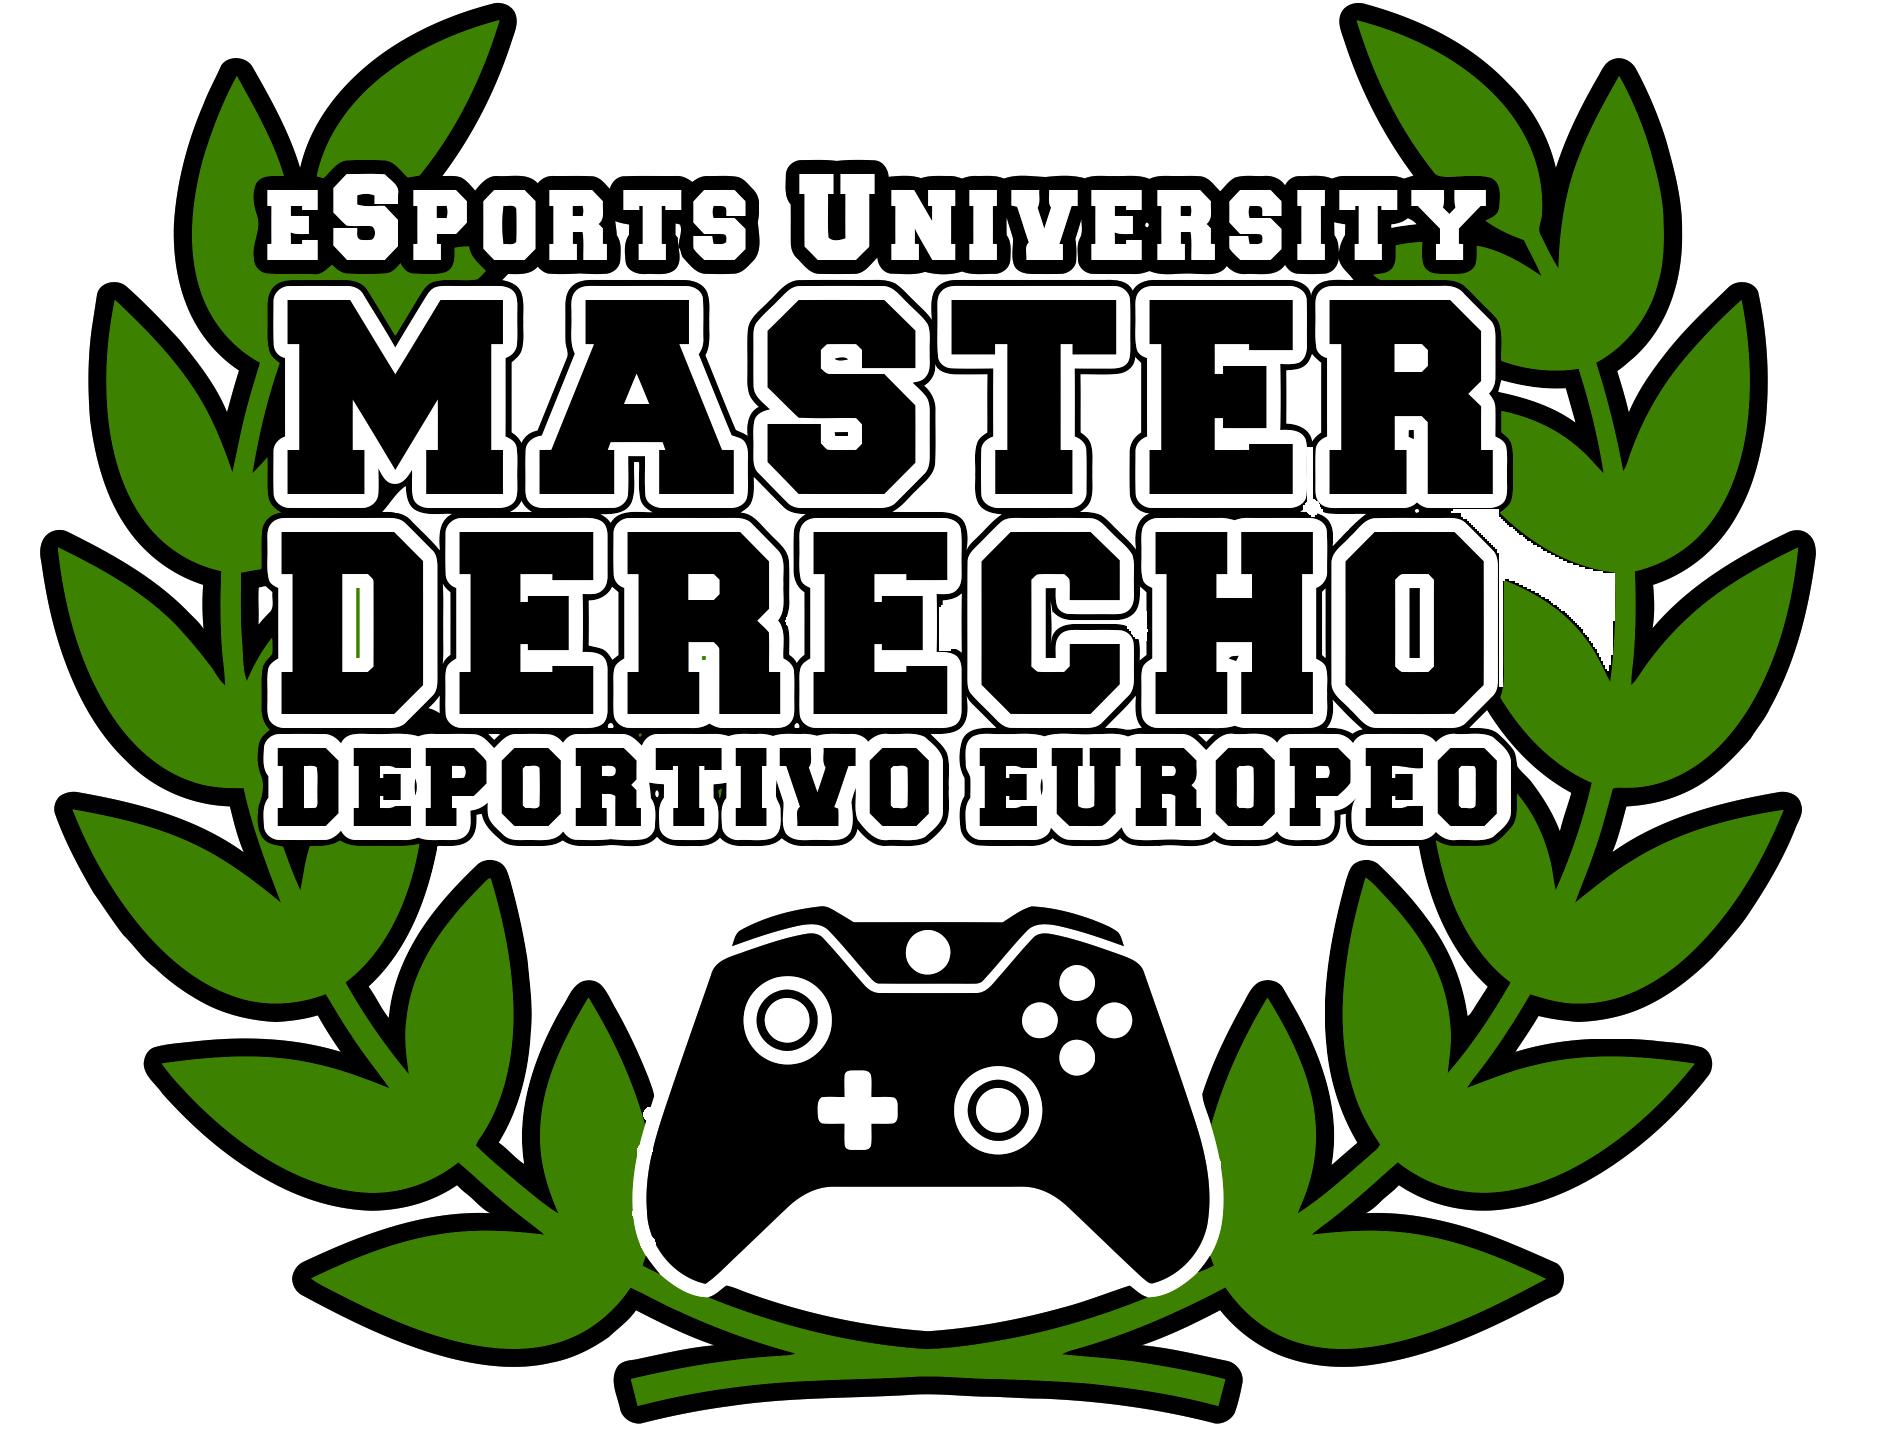 E-Sports University